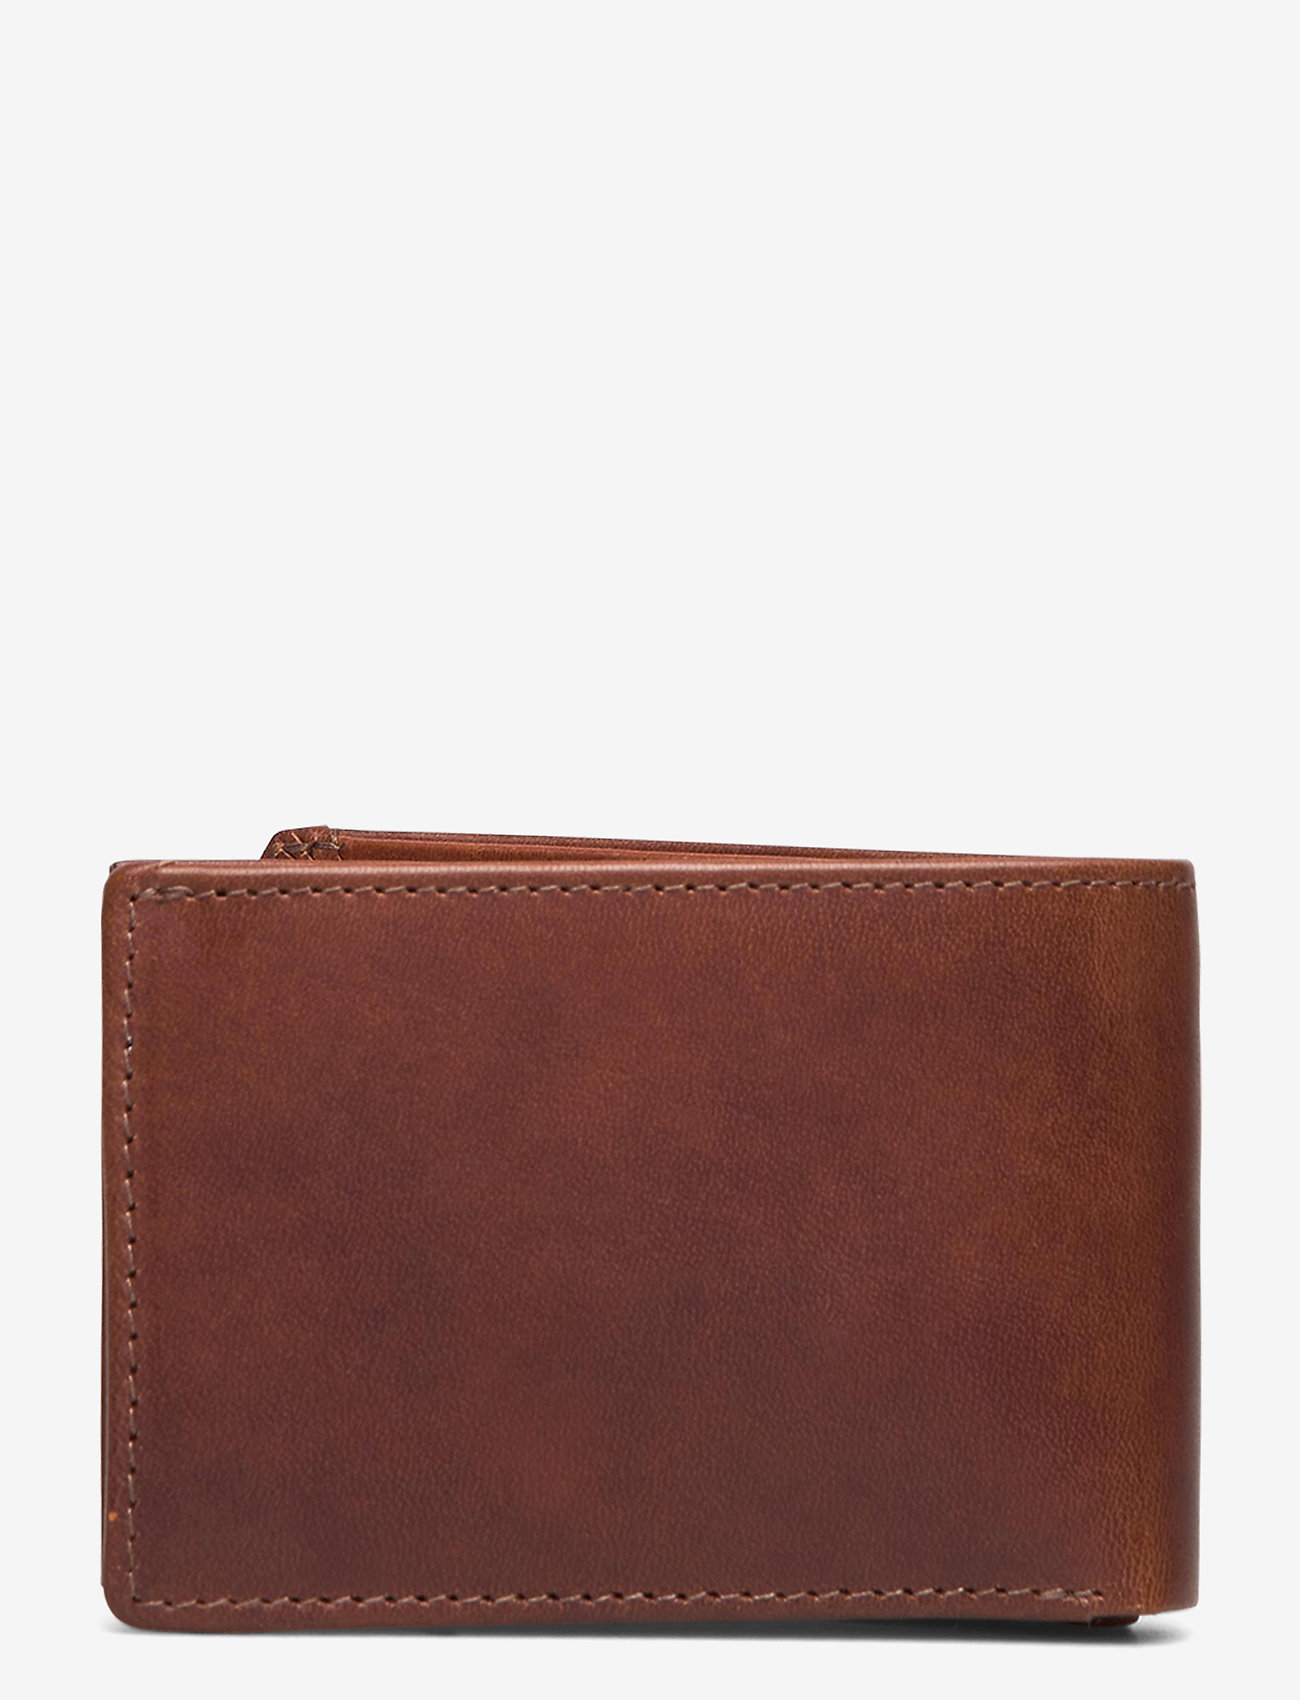 SDLR - Rybakken - wallets - brown - 1